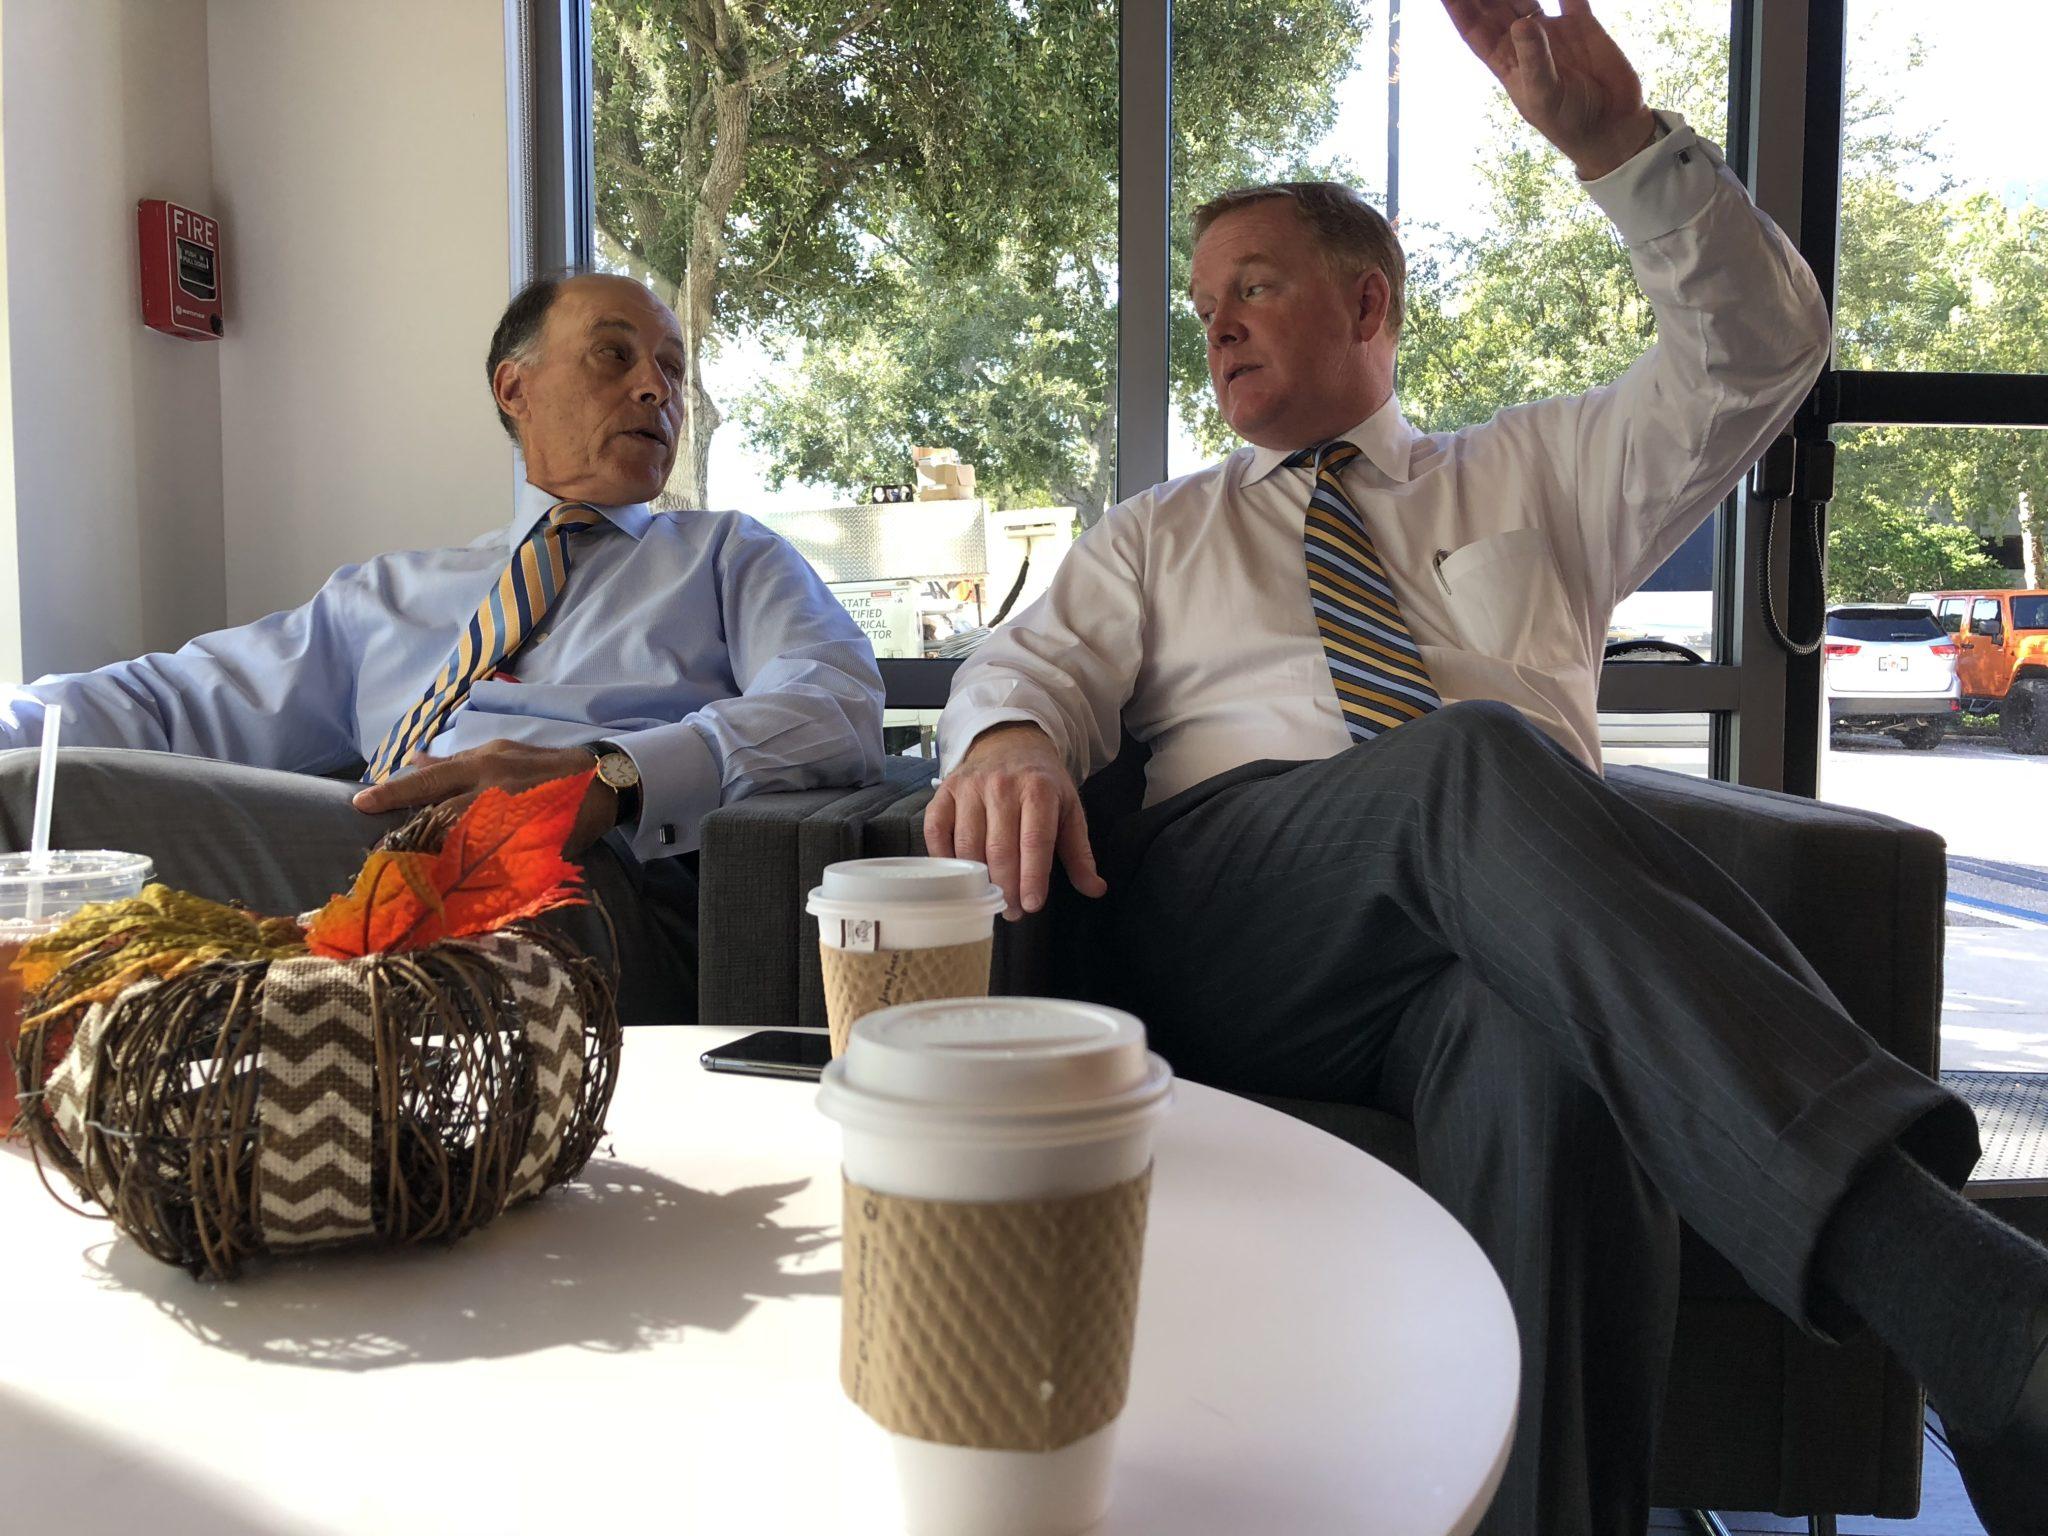 Dan Doyle Jr. and Paul Natale Talking at DEXpresso Cafe